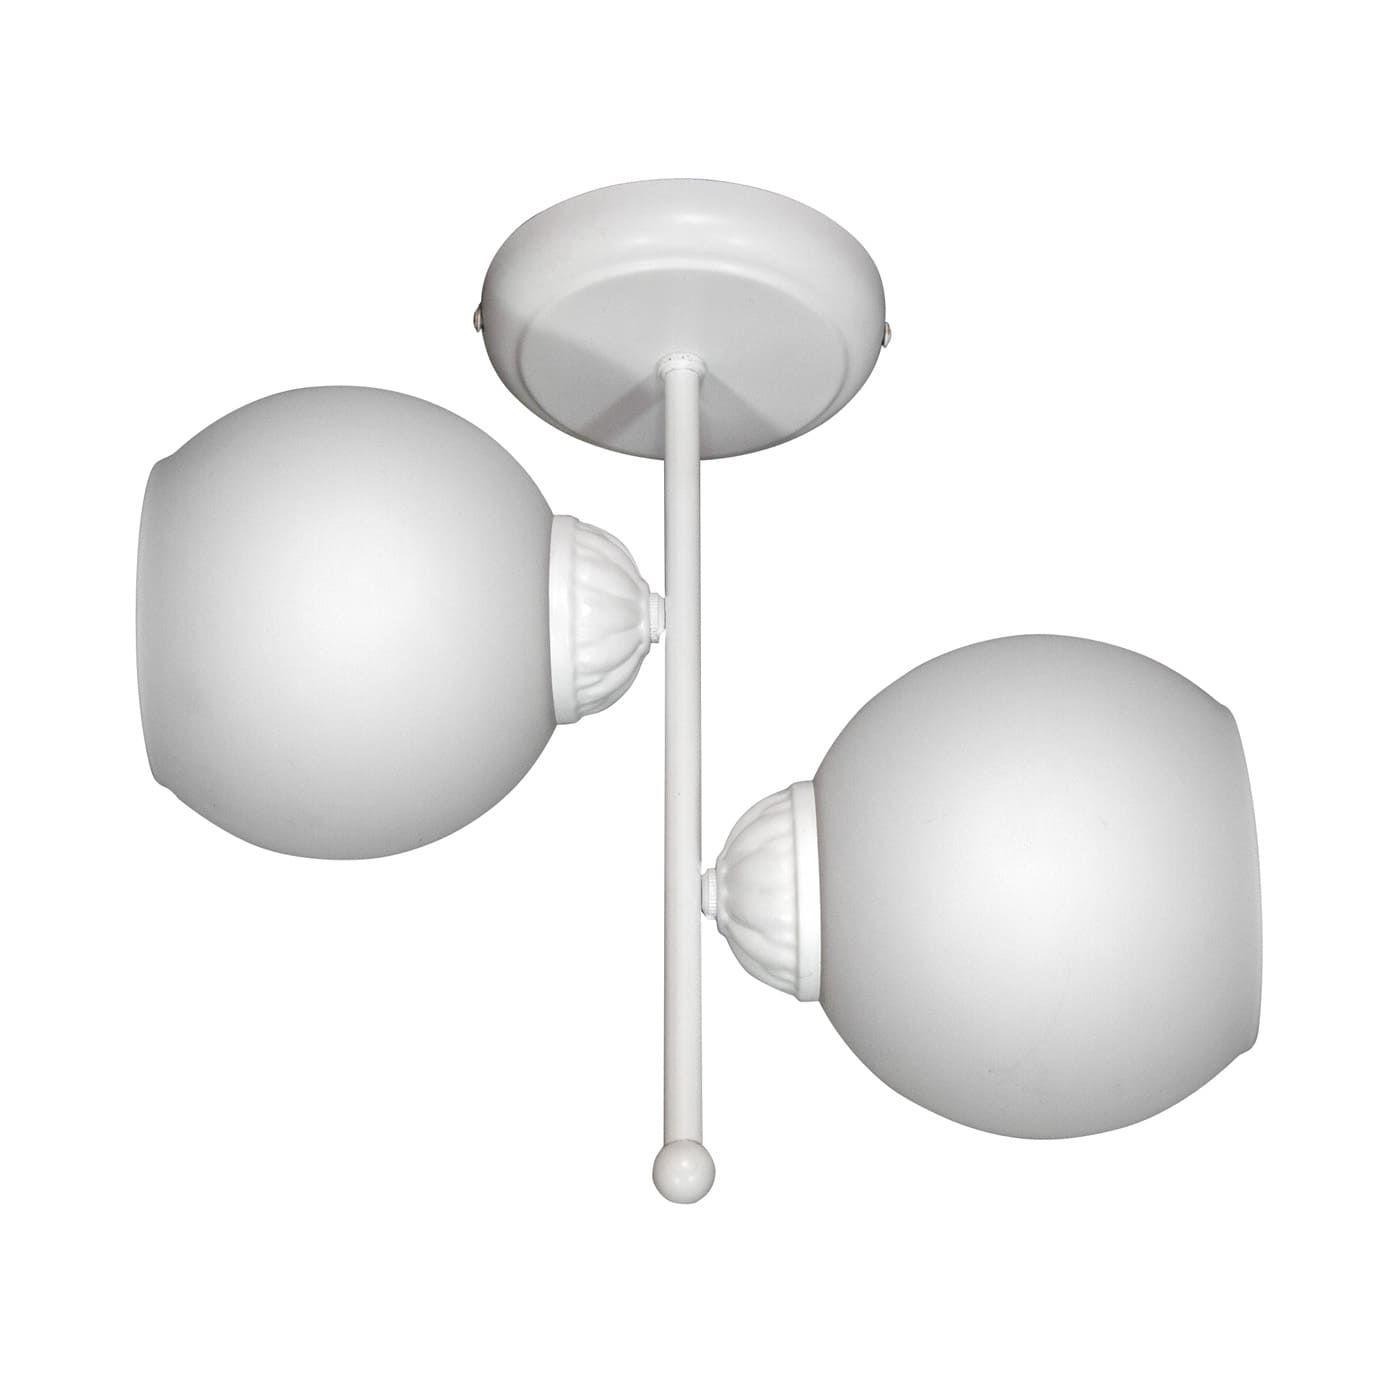 PETRASVET / Ceiling chandelier S2385-2, 2xE27 max. 60W